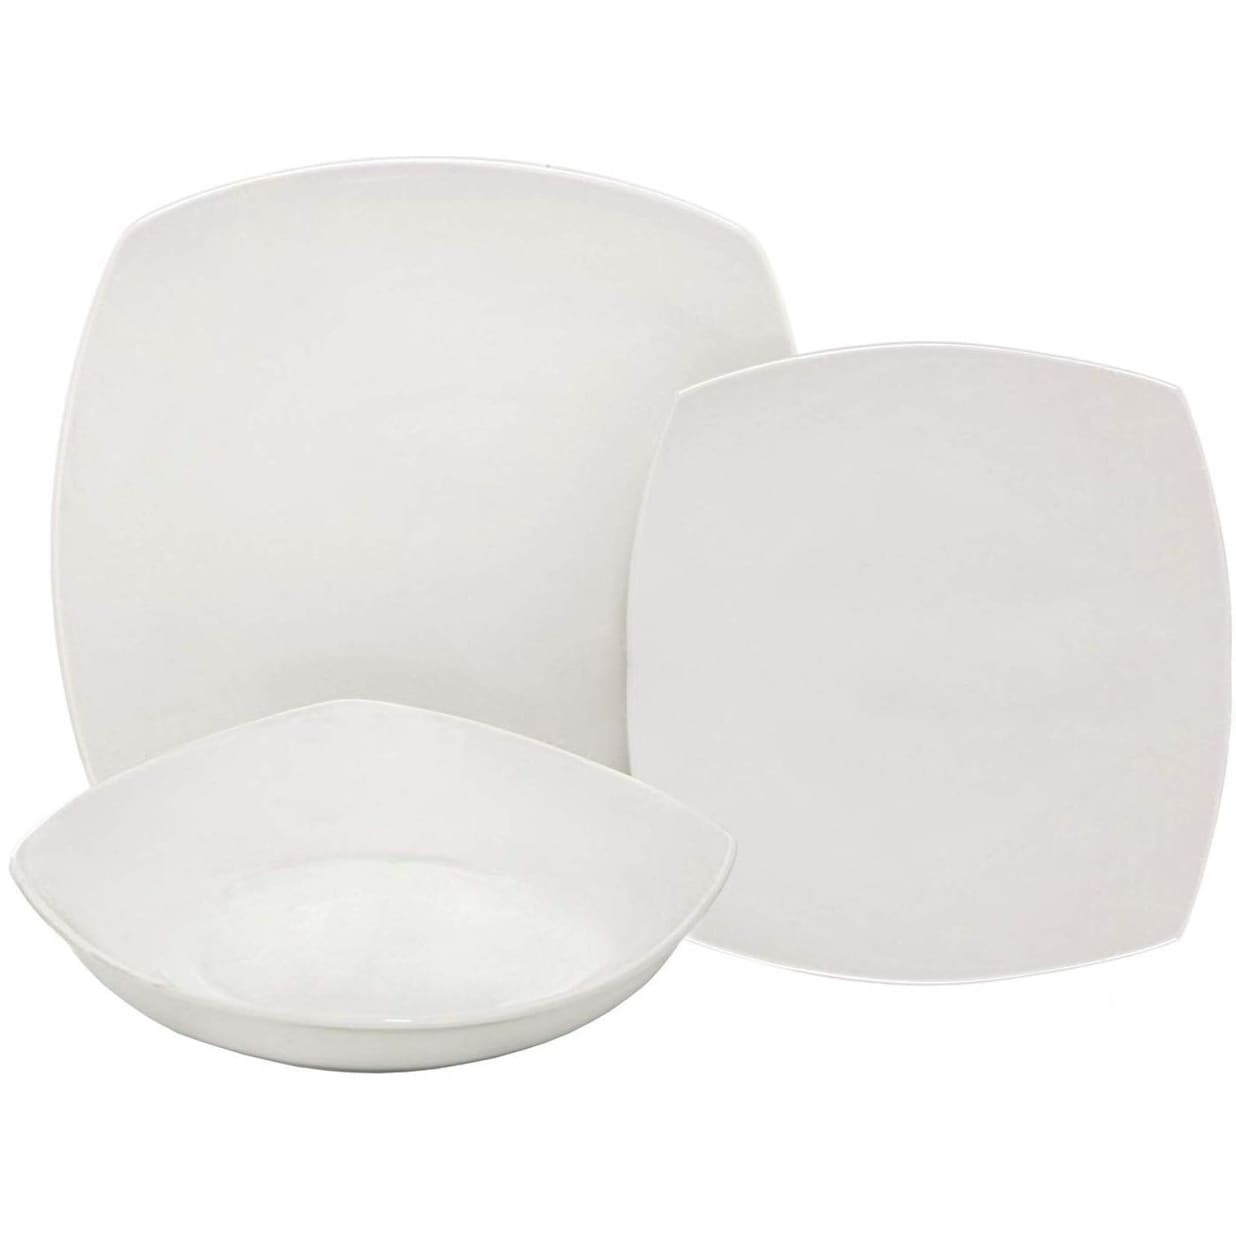 Ceramic Dinnerware Set of Dessert Dinner Plates and Soup Serving-Salad Bowl